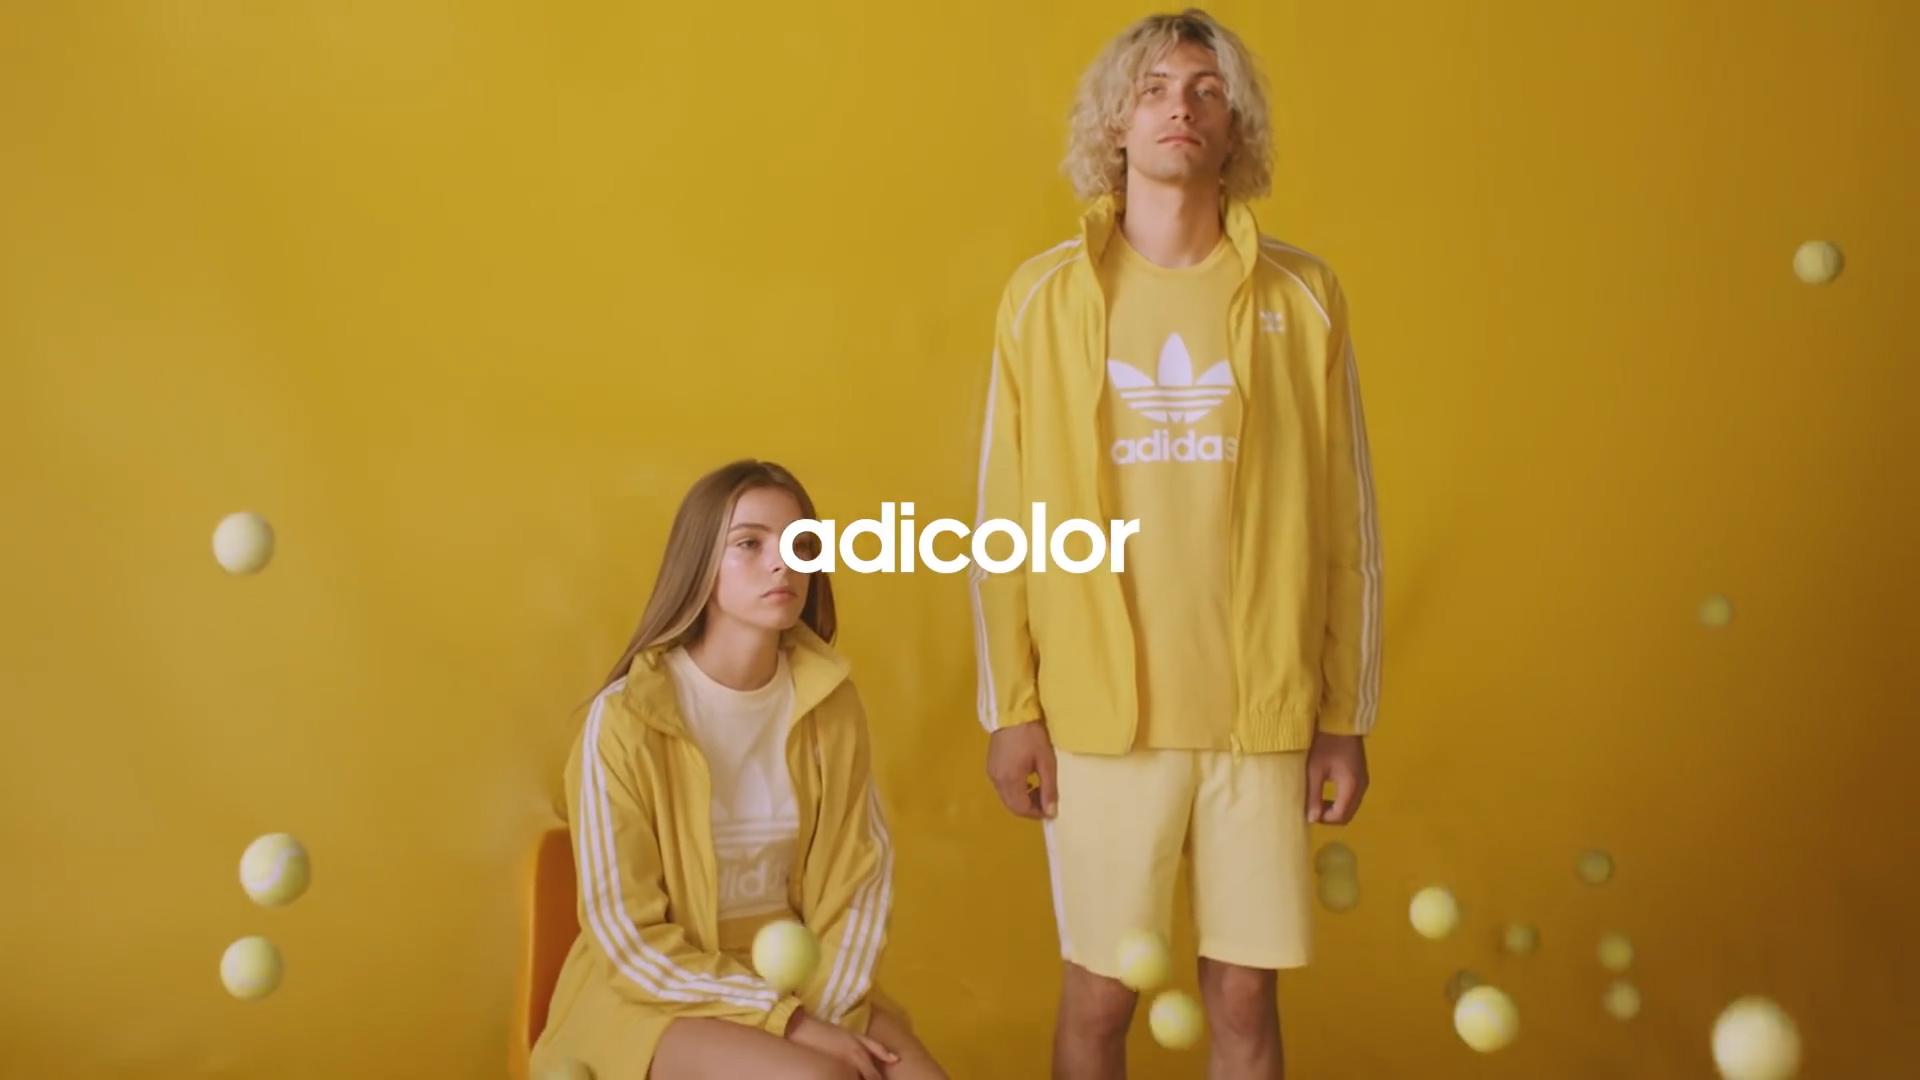 adicolor - adidas Originals